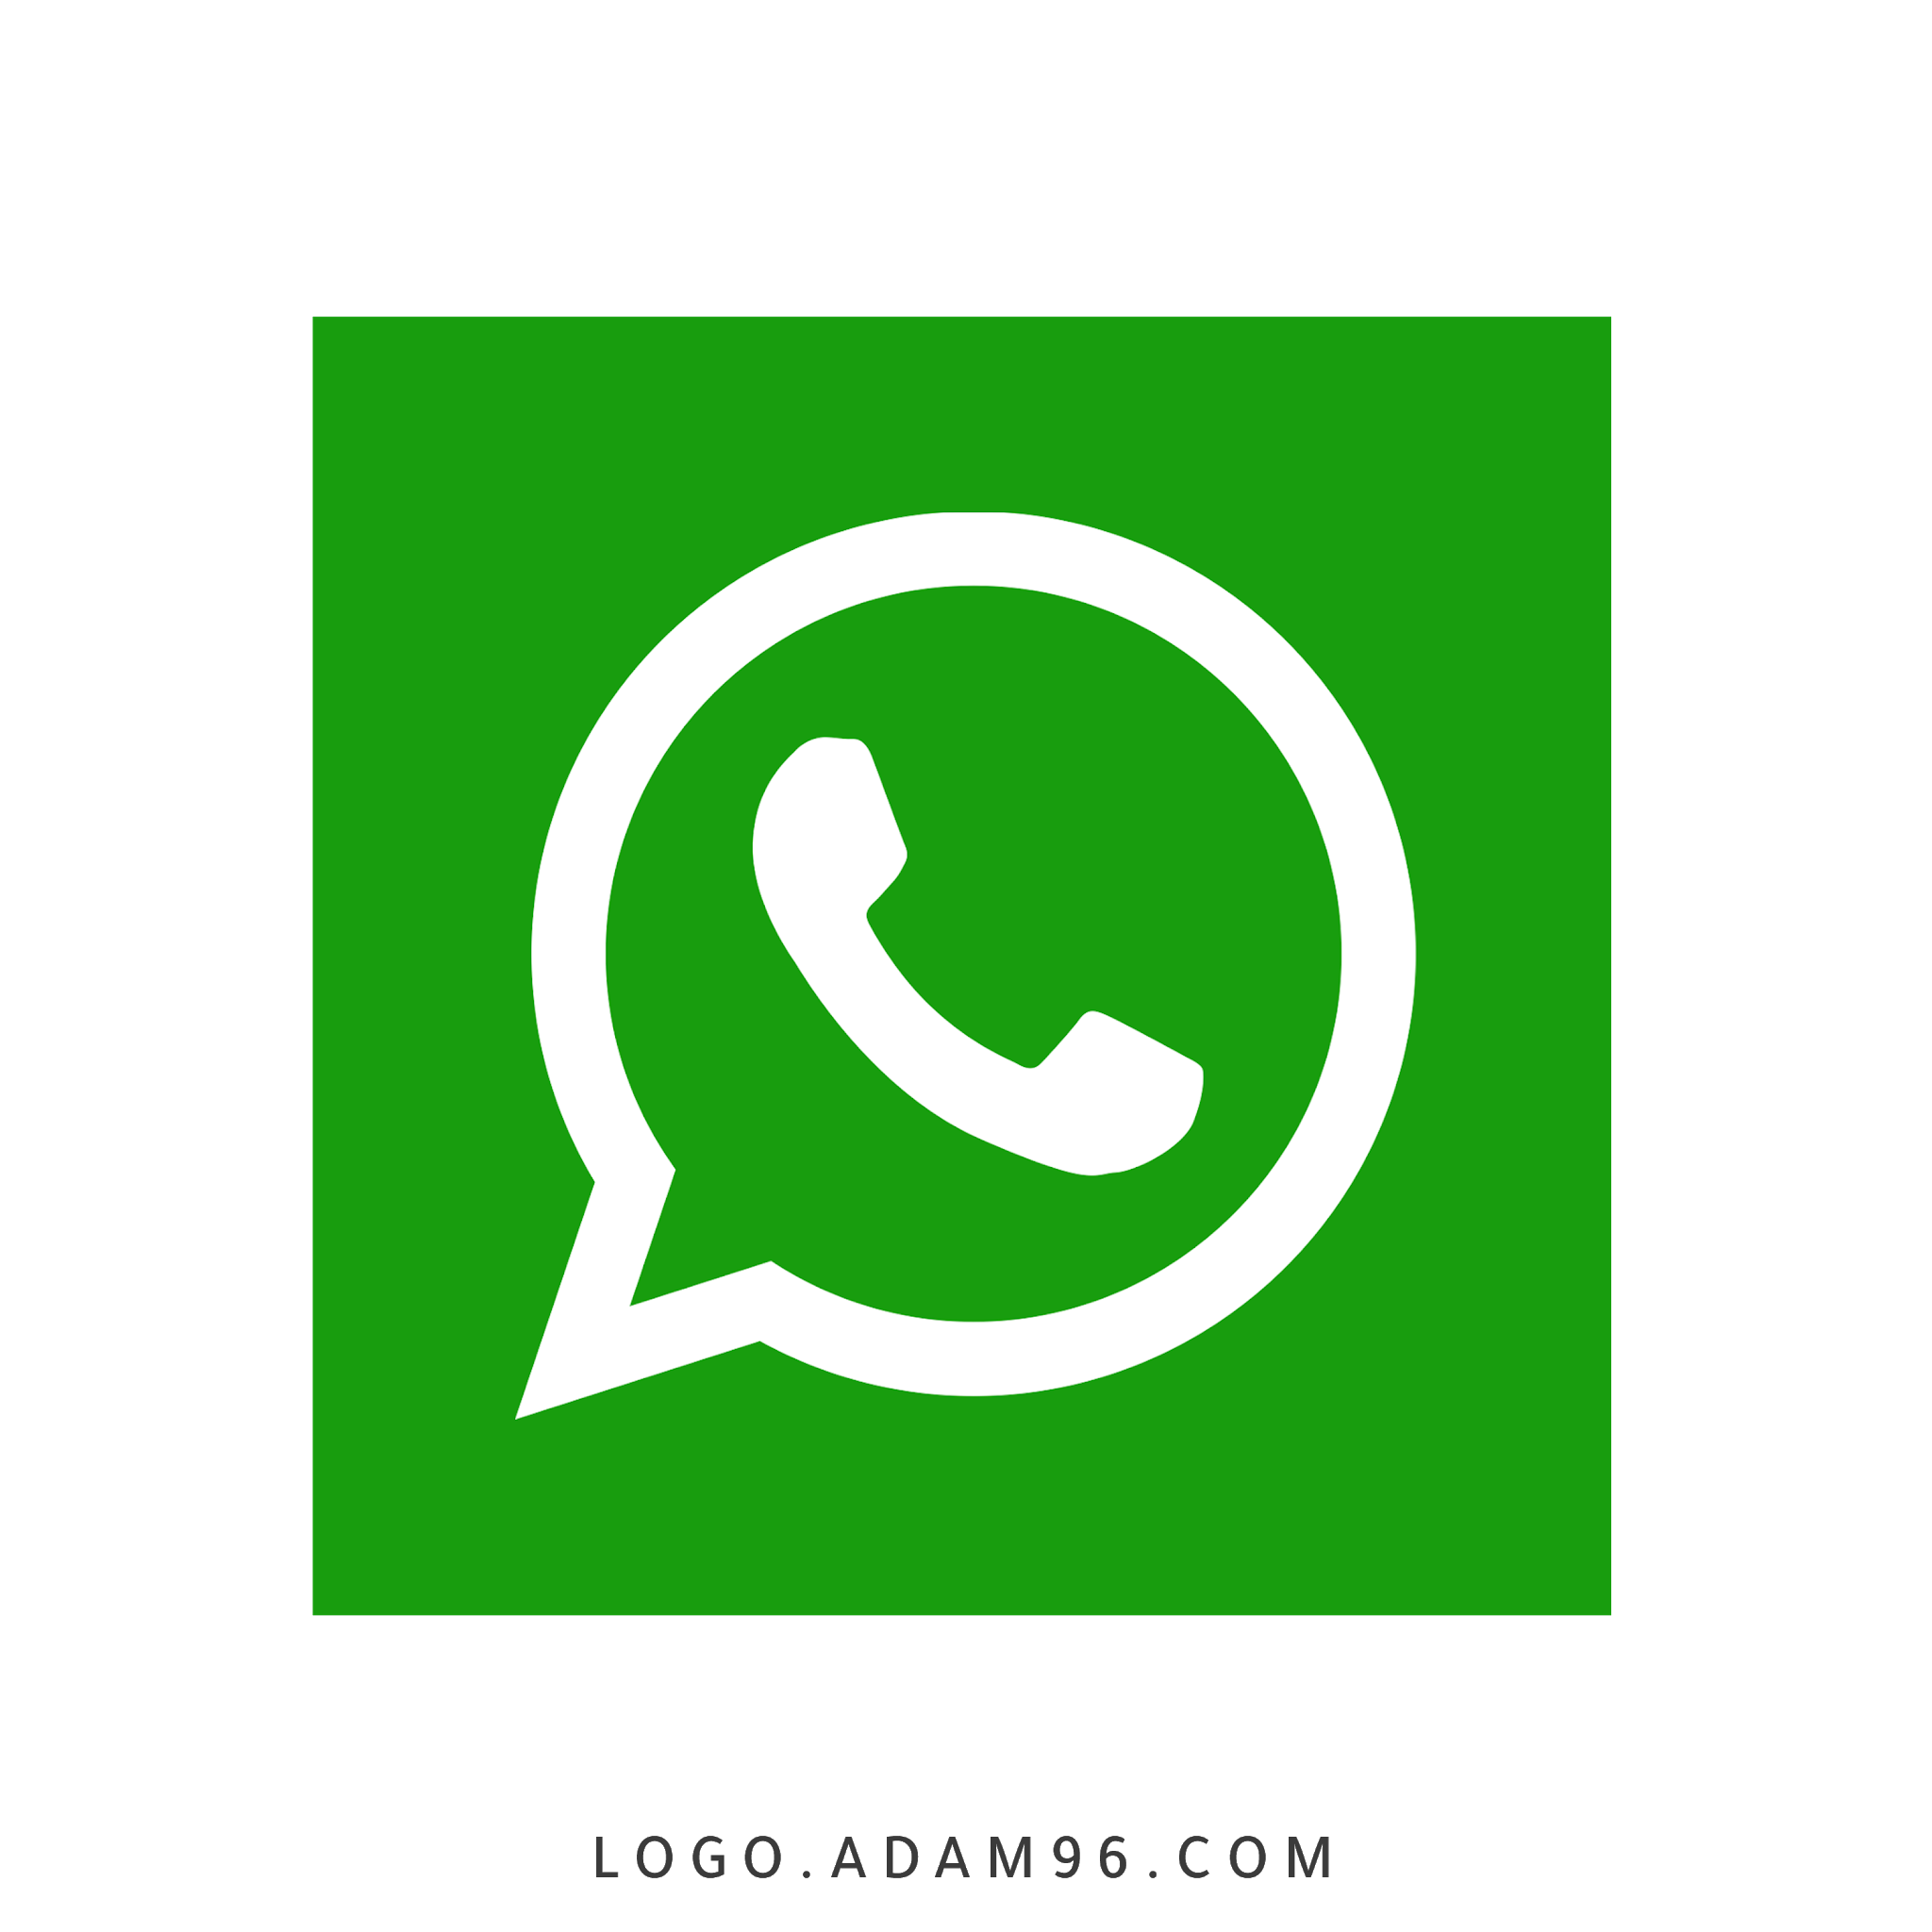 تحميل شعار واتساب مربع لوجو رسمي بدقة عالية Logo WhatsApp PNG